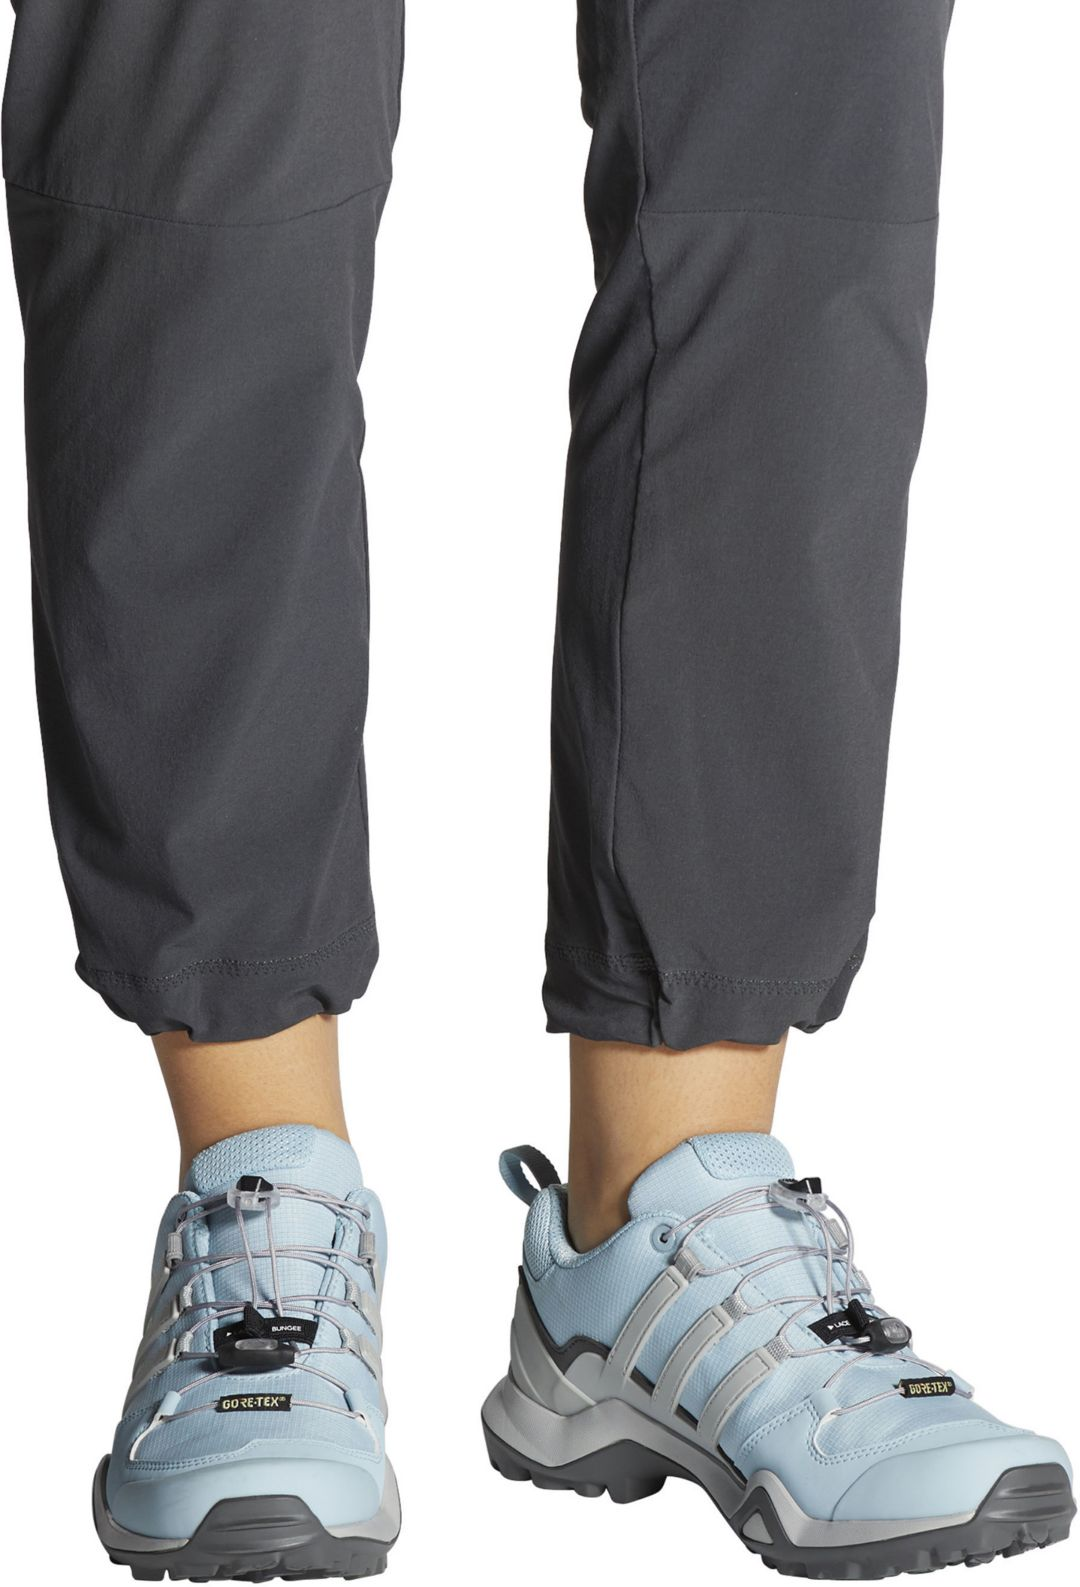 authorized site get cheap san francisco adidas Terrex Women's Swift R2 GTX Waterproof Hiking Shoes